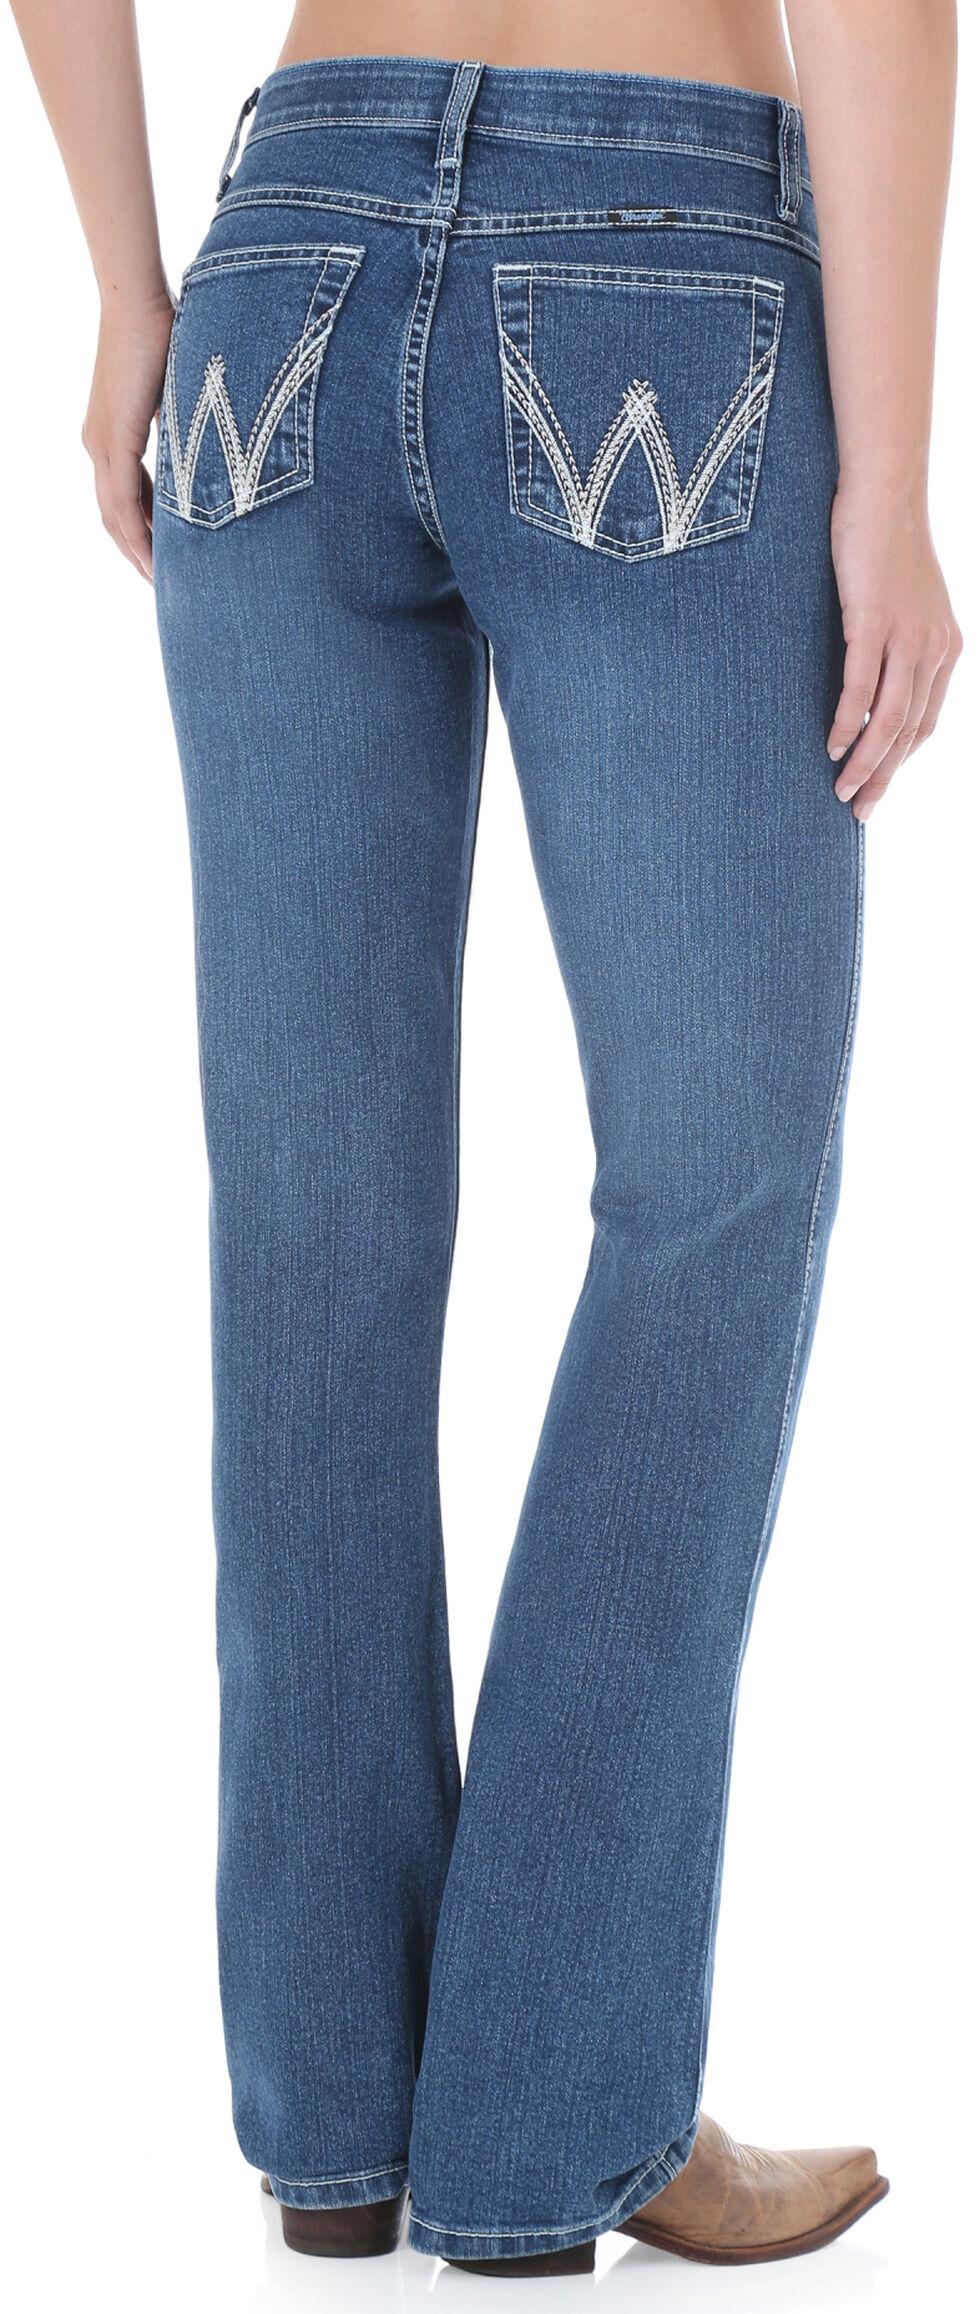 Wrangler Women's Medium Wash Cool Vantage Ultimate Riding Q-Baby Jeans, Denim, hi-res